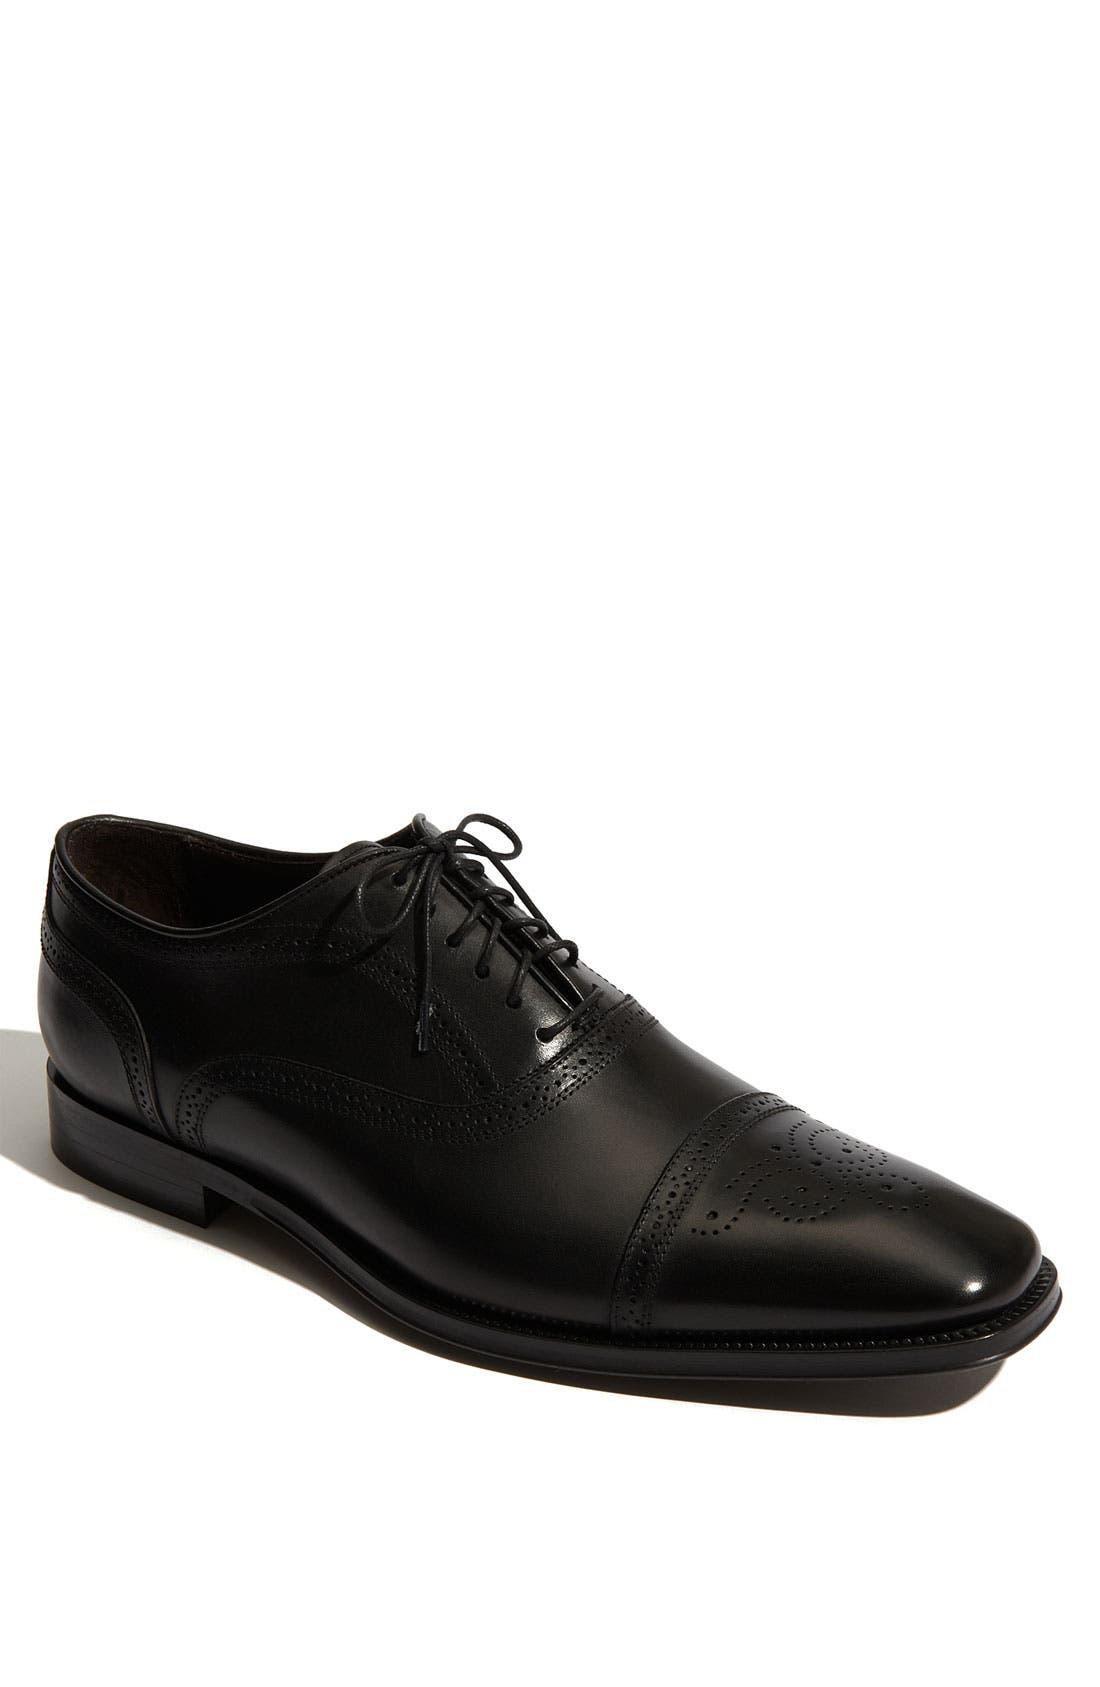 Main Image - To Boot New York 'Aaron' Oxford (Men)